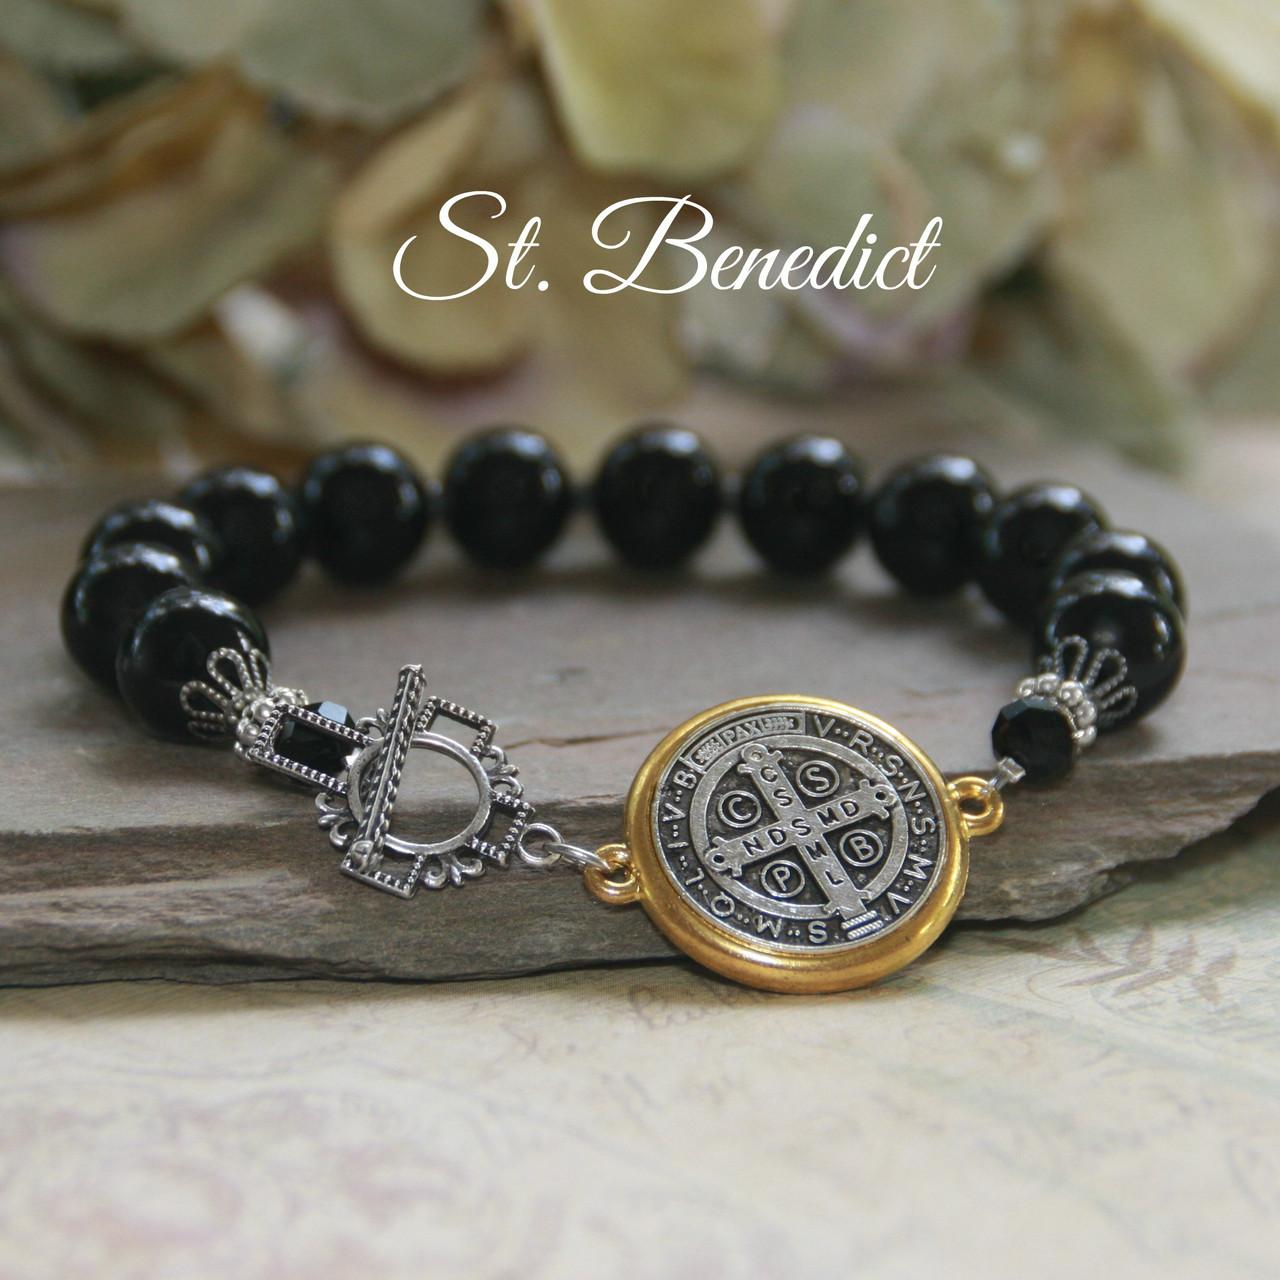 IN-728  St. Benedict Stylish Bracelet